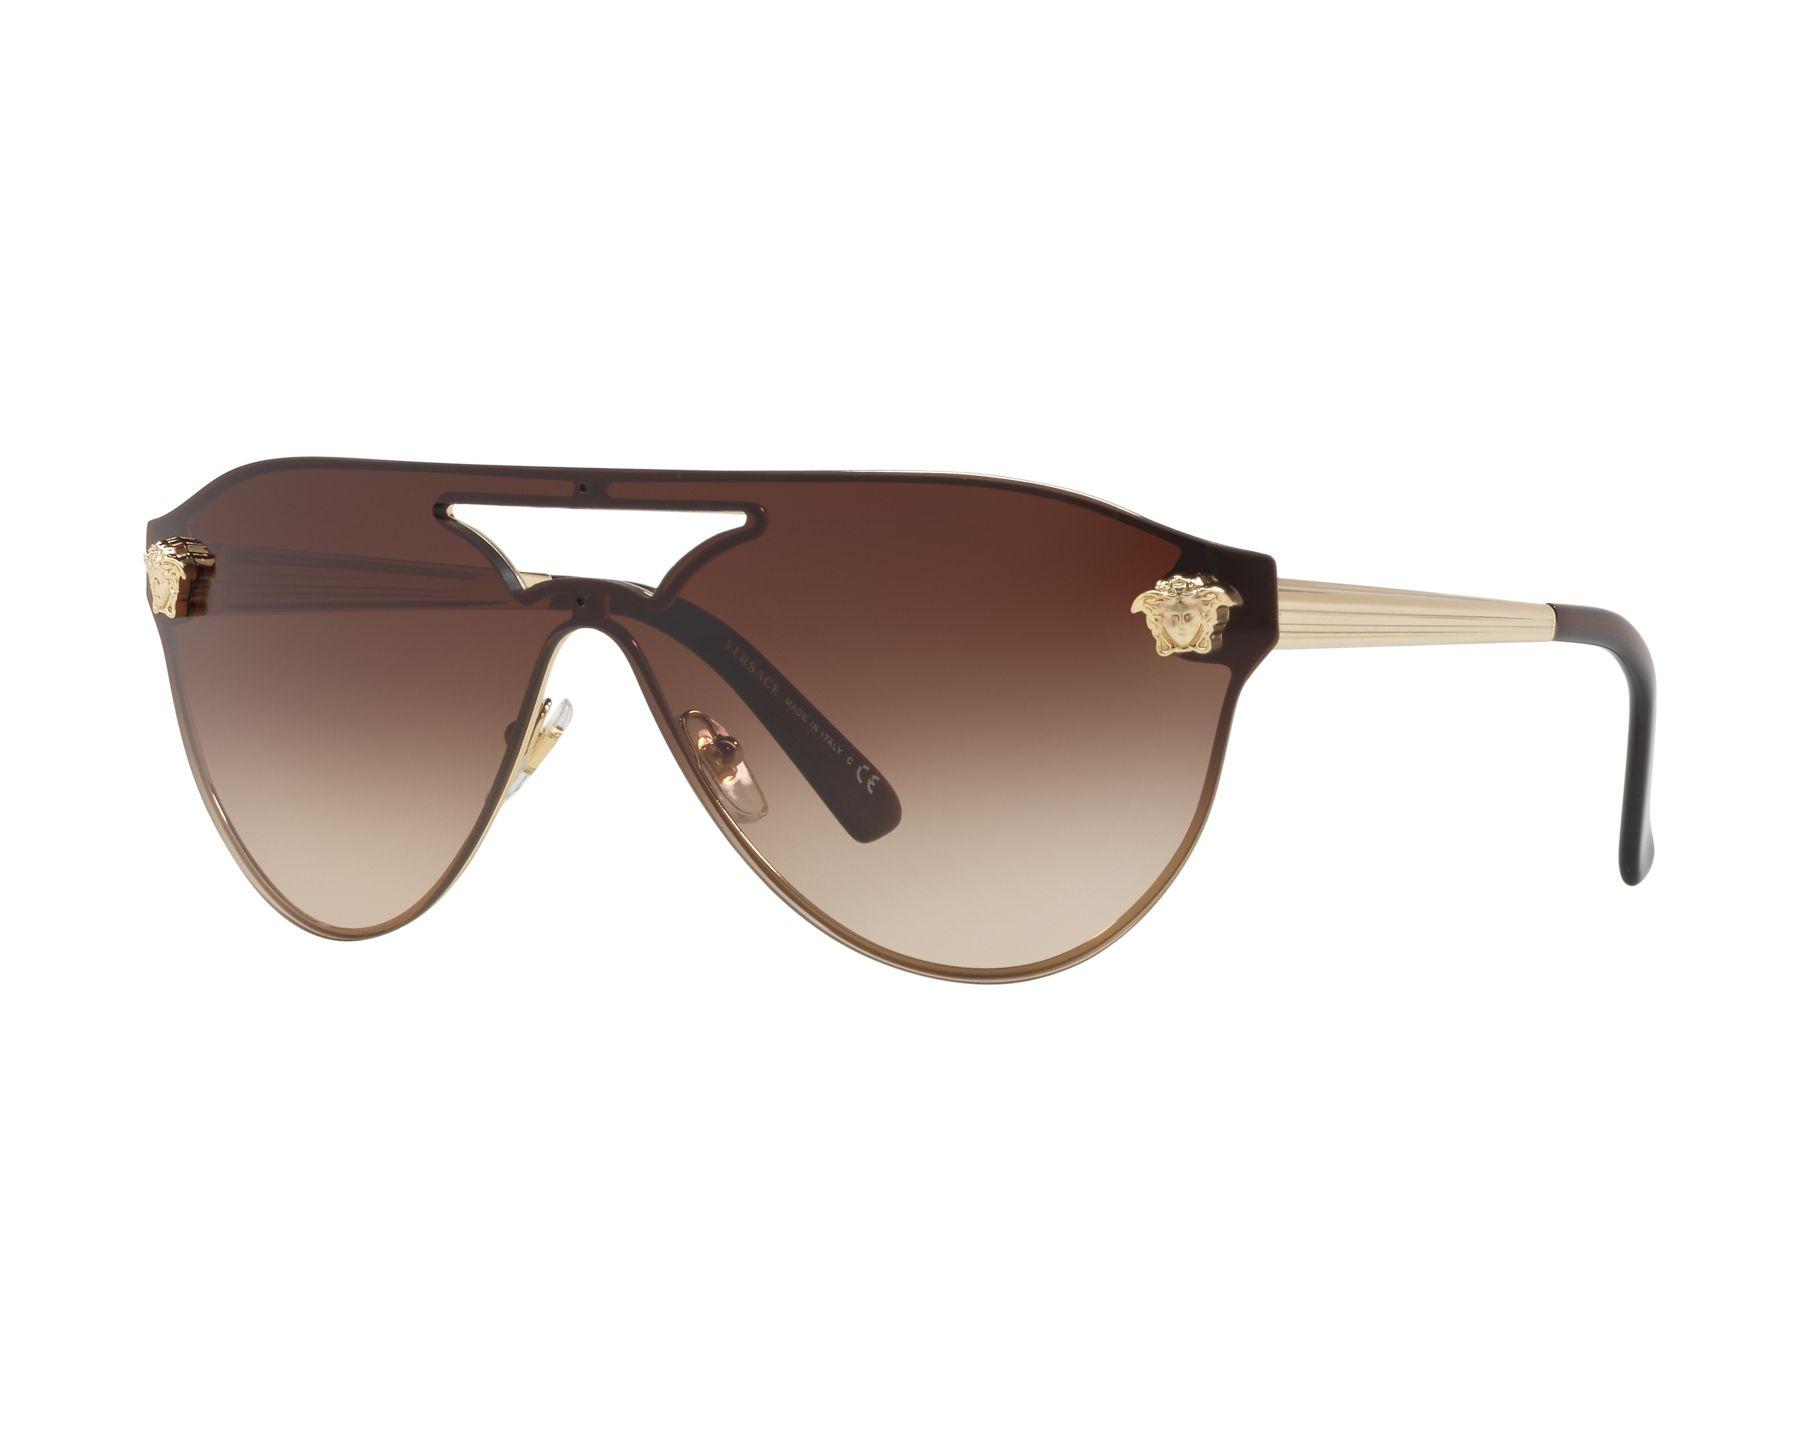 lunettes de soleil versace ve 2161 125213 or avec des verres marron. Black Bedroom Furniture Sets. Home Design Ideas